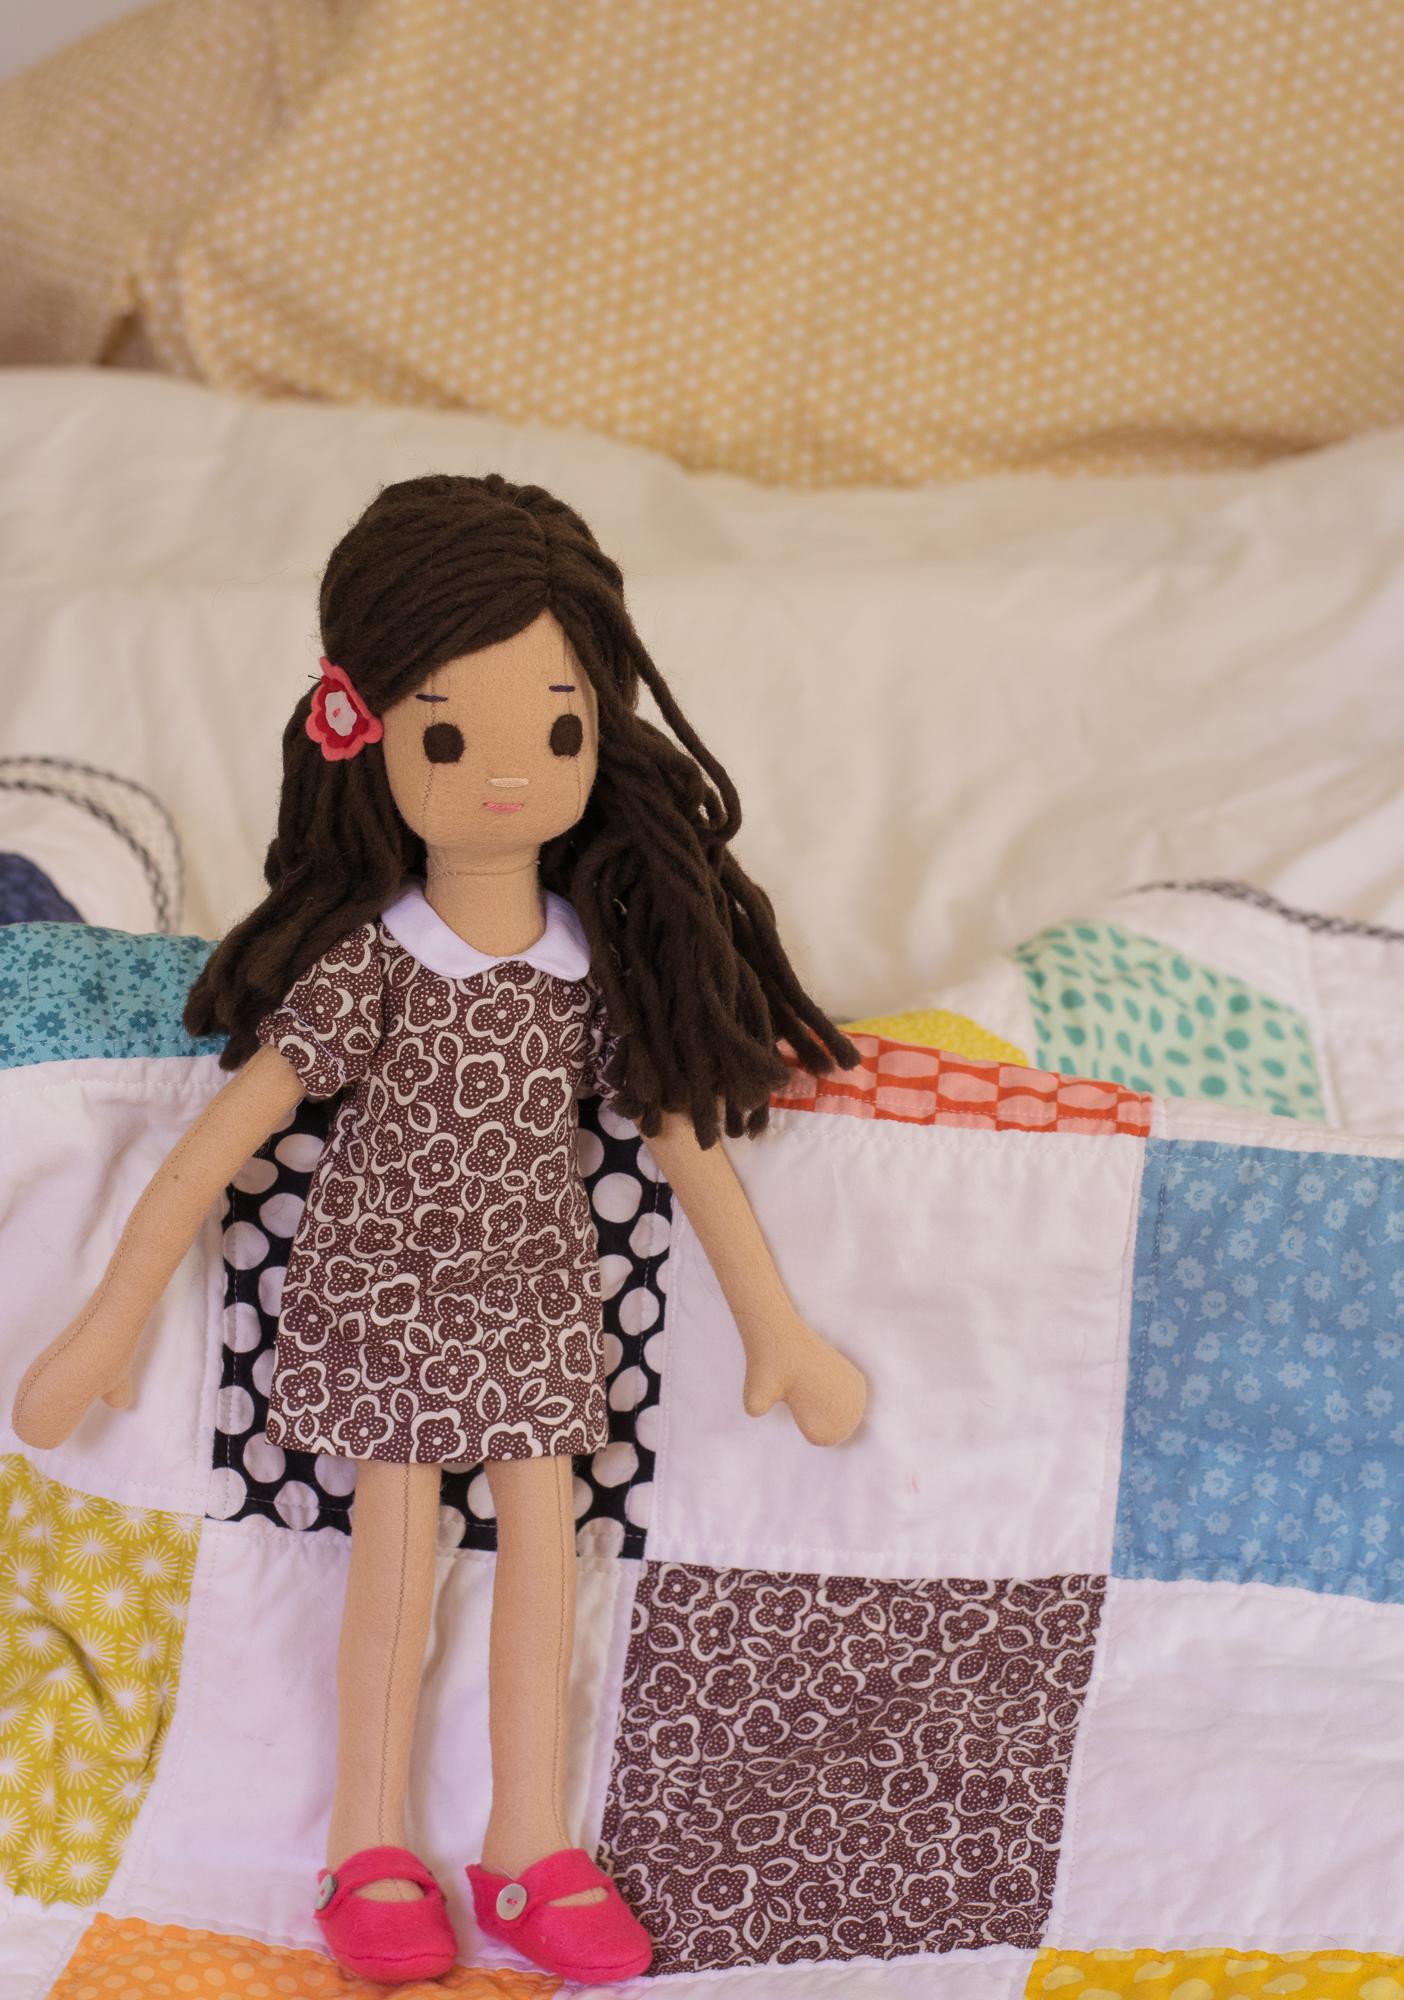 Gallery of Dolls-30.jpg